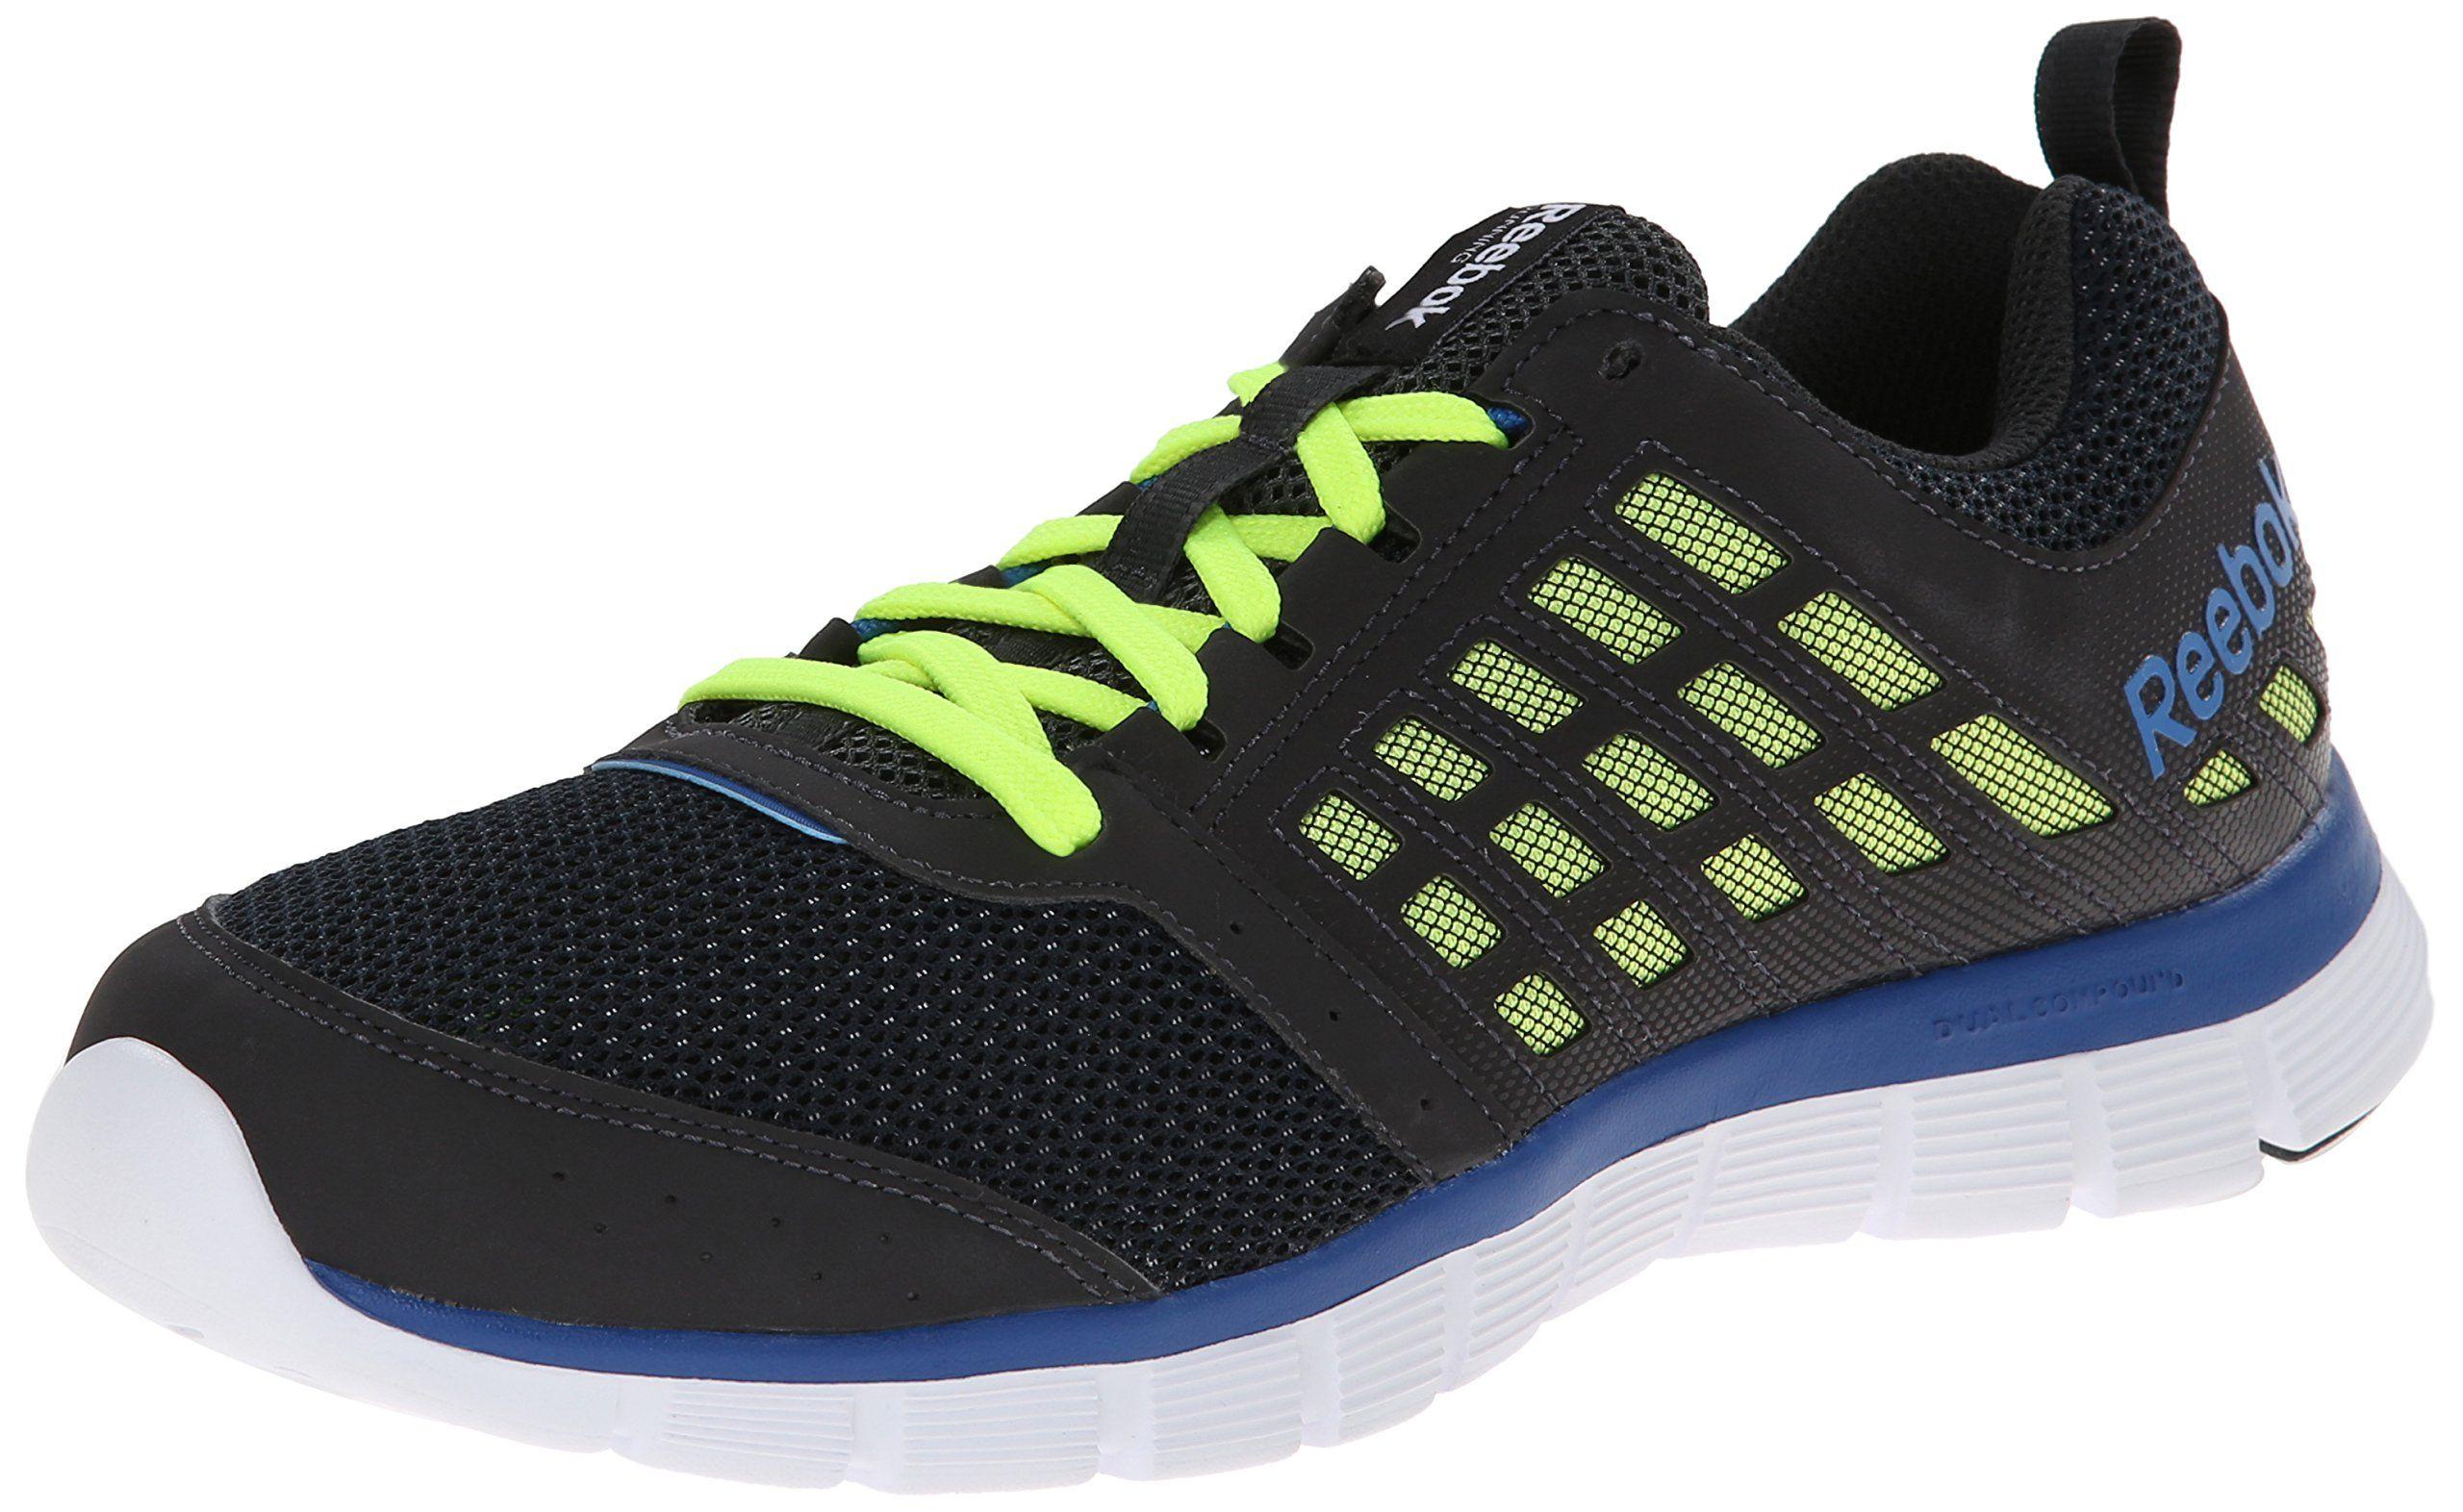 035bbe4883ac1 Reebok Men s Reebok Z Dual Ride Running Shoe